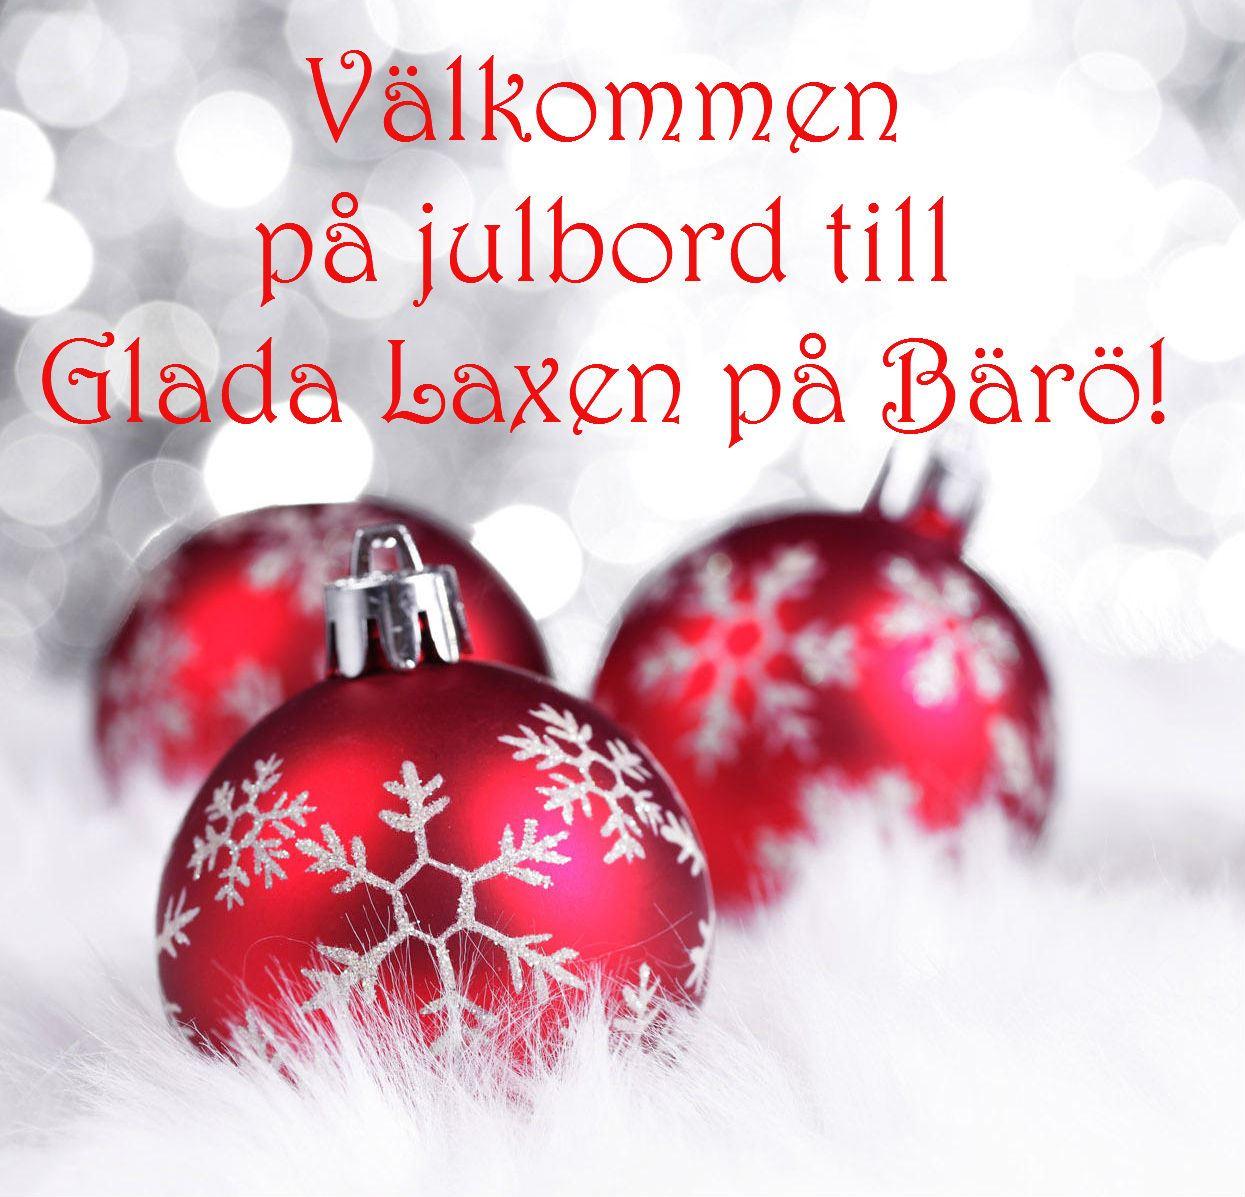 Christmas buffet at Glada Laxen